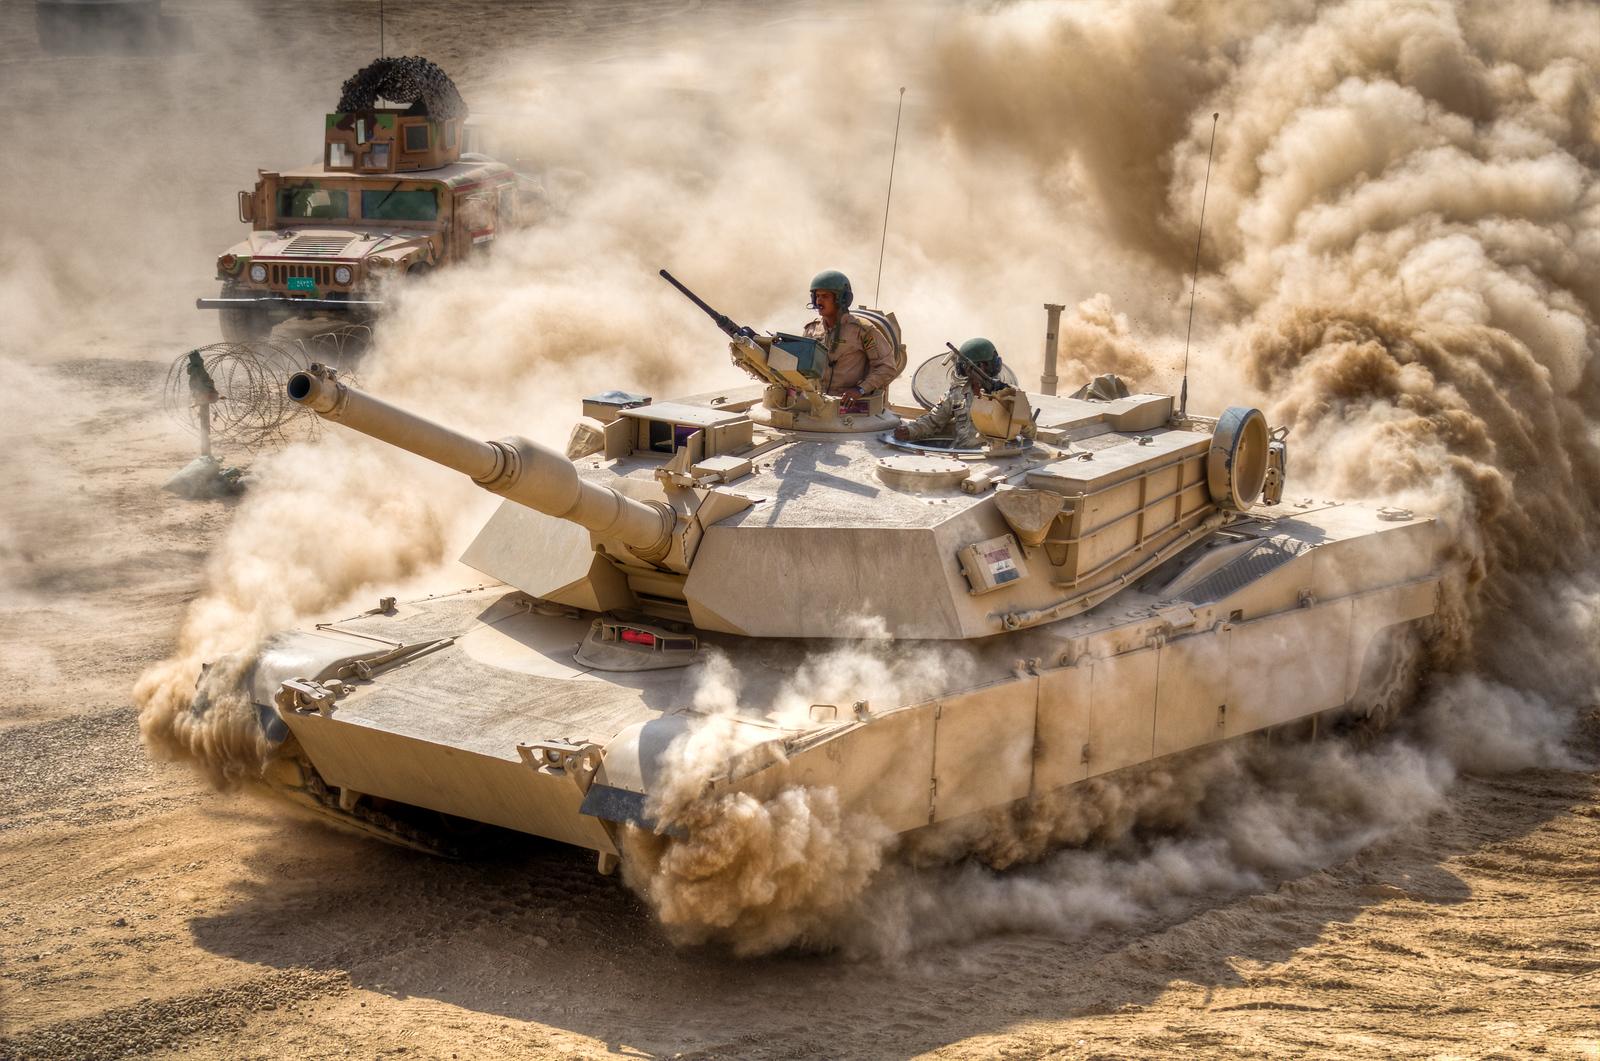 18 OCT 2011 -  Iraqi leadership host OSC-I Chief and NTM-I Commander LTG Caslen for Howitzer and M1A1 tank demonstrations in Besmaya, Iraq. U.S. Army photo by John D. Helms - john.helms@iraq.centcom.mil.